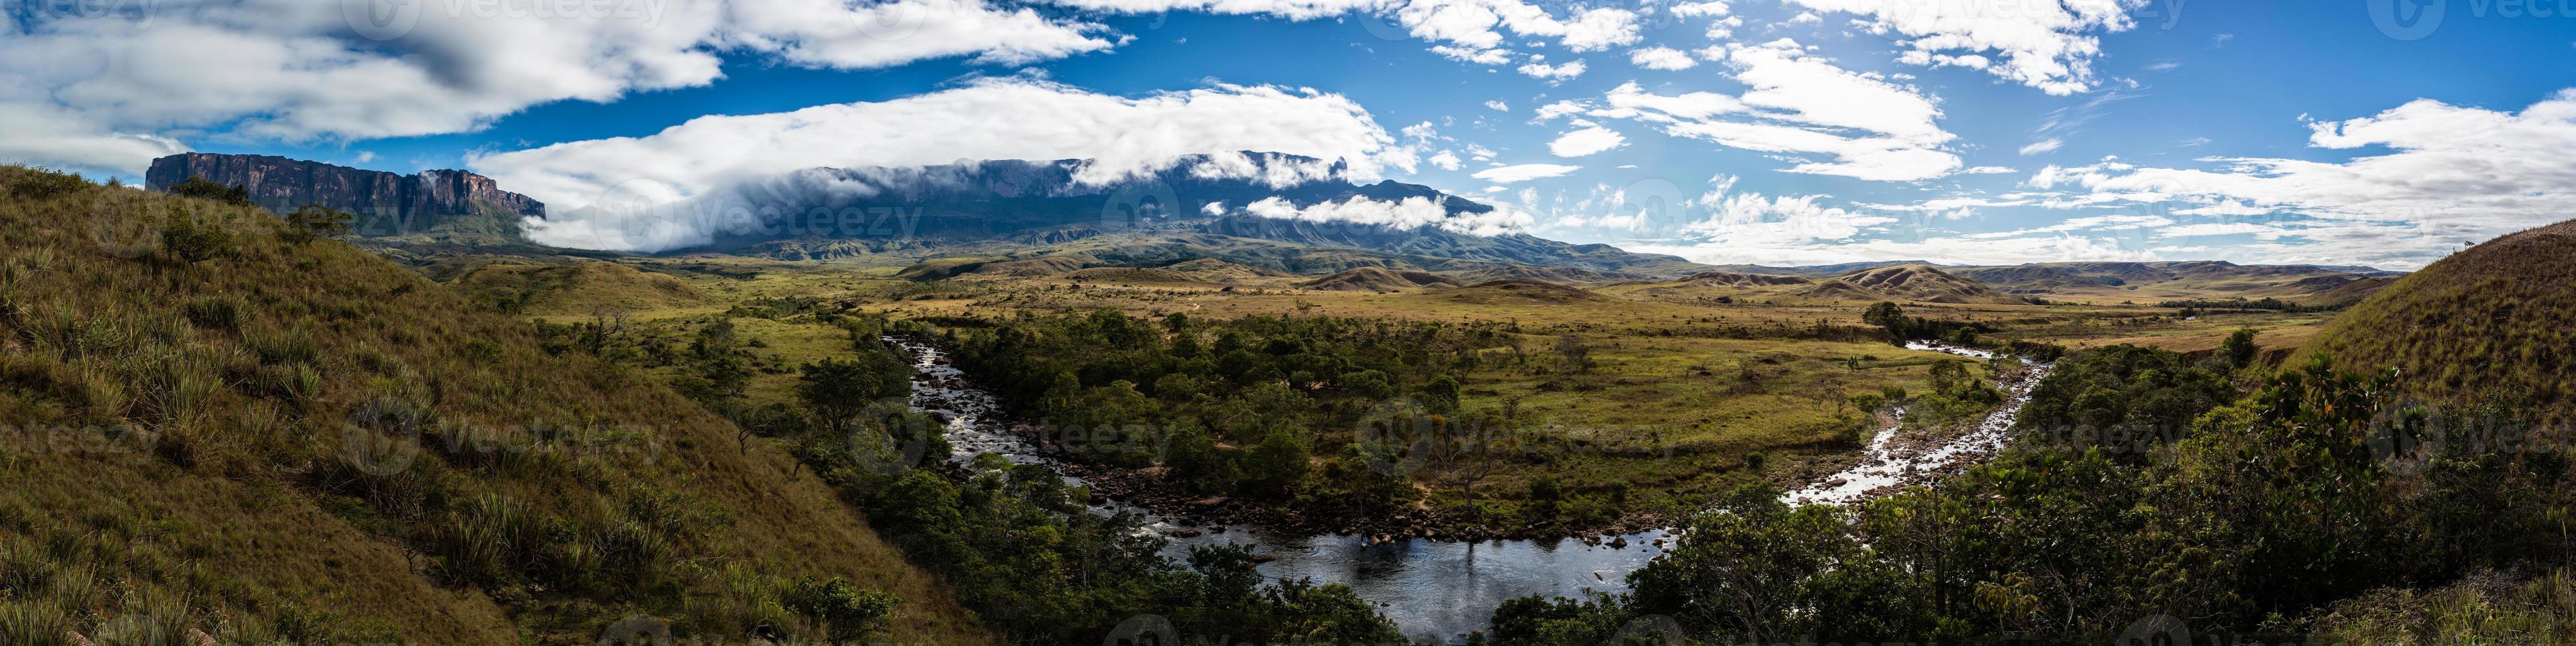 parque nacional de canaima na venezuela foto